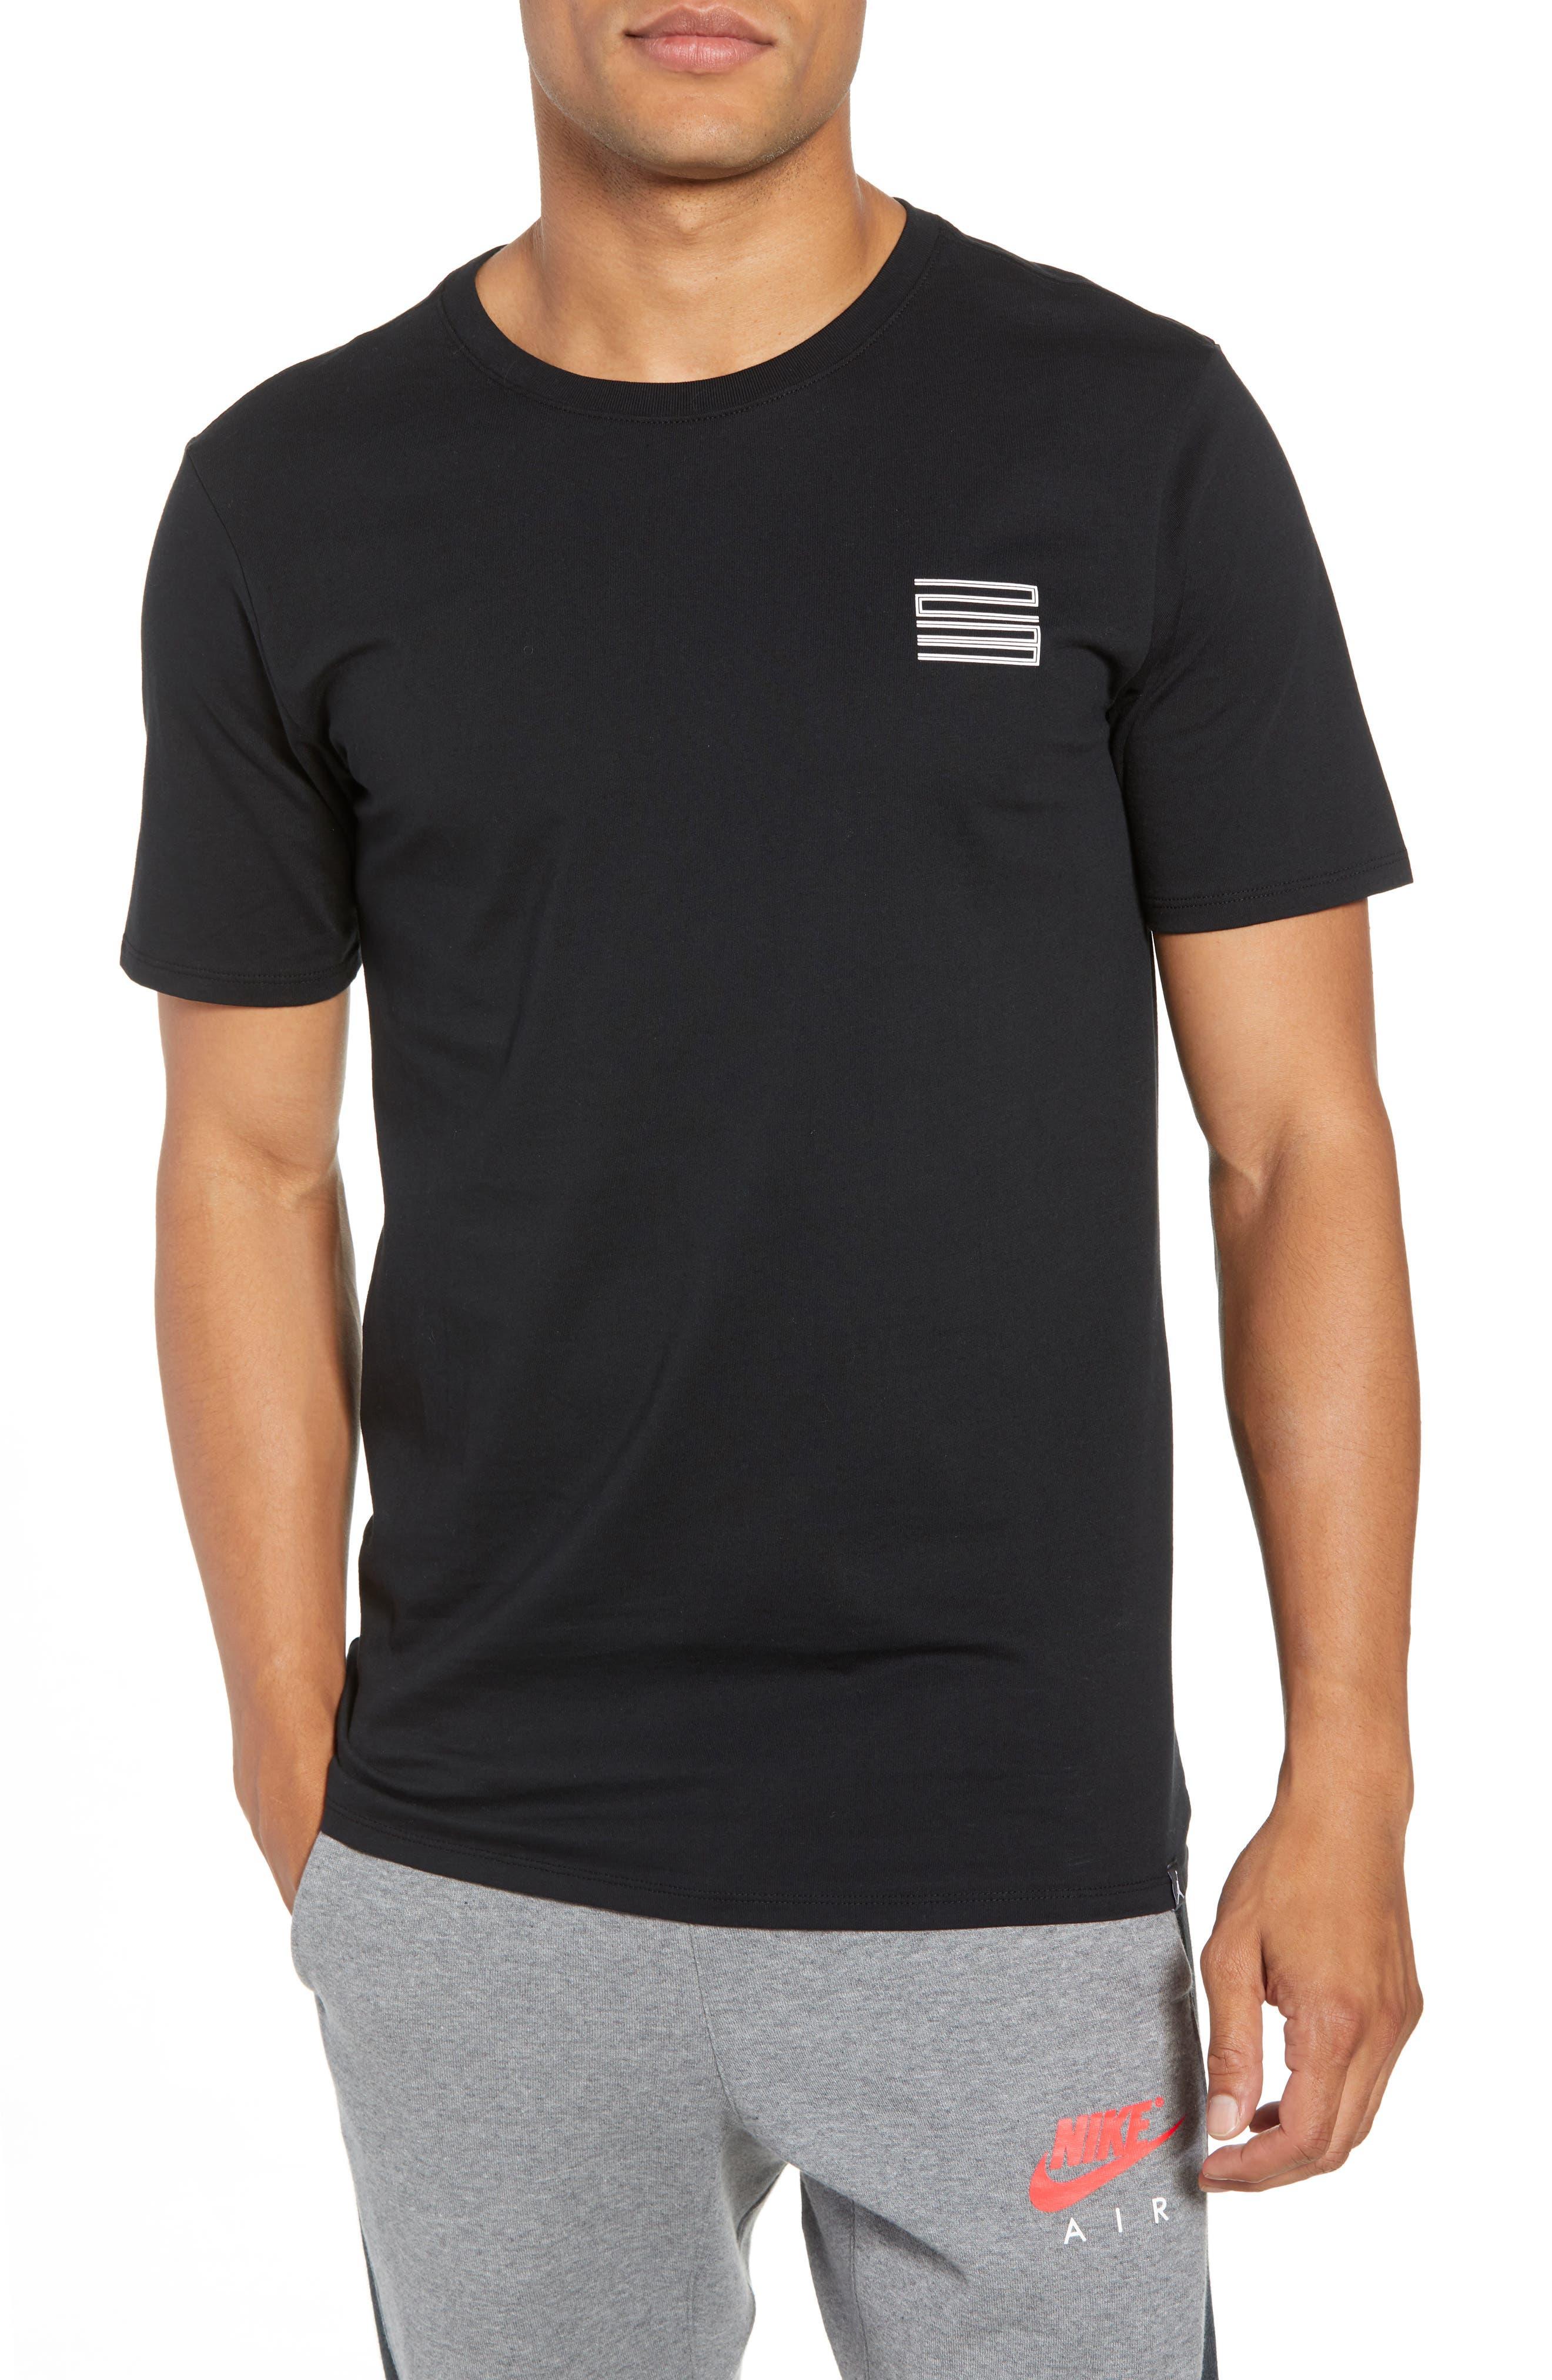 Jordan Graphic T-Shirt, Black